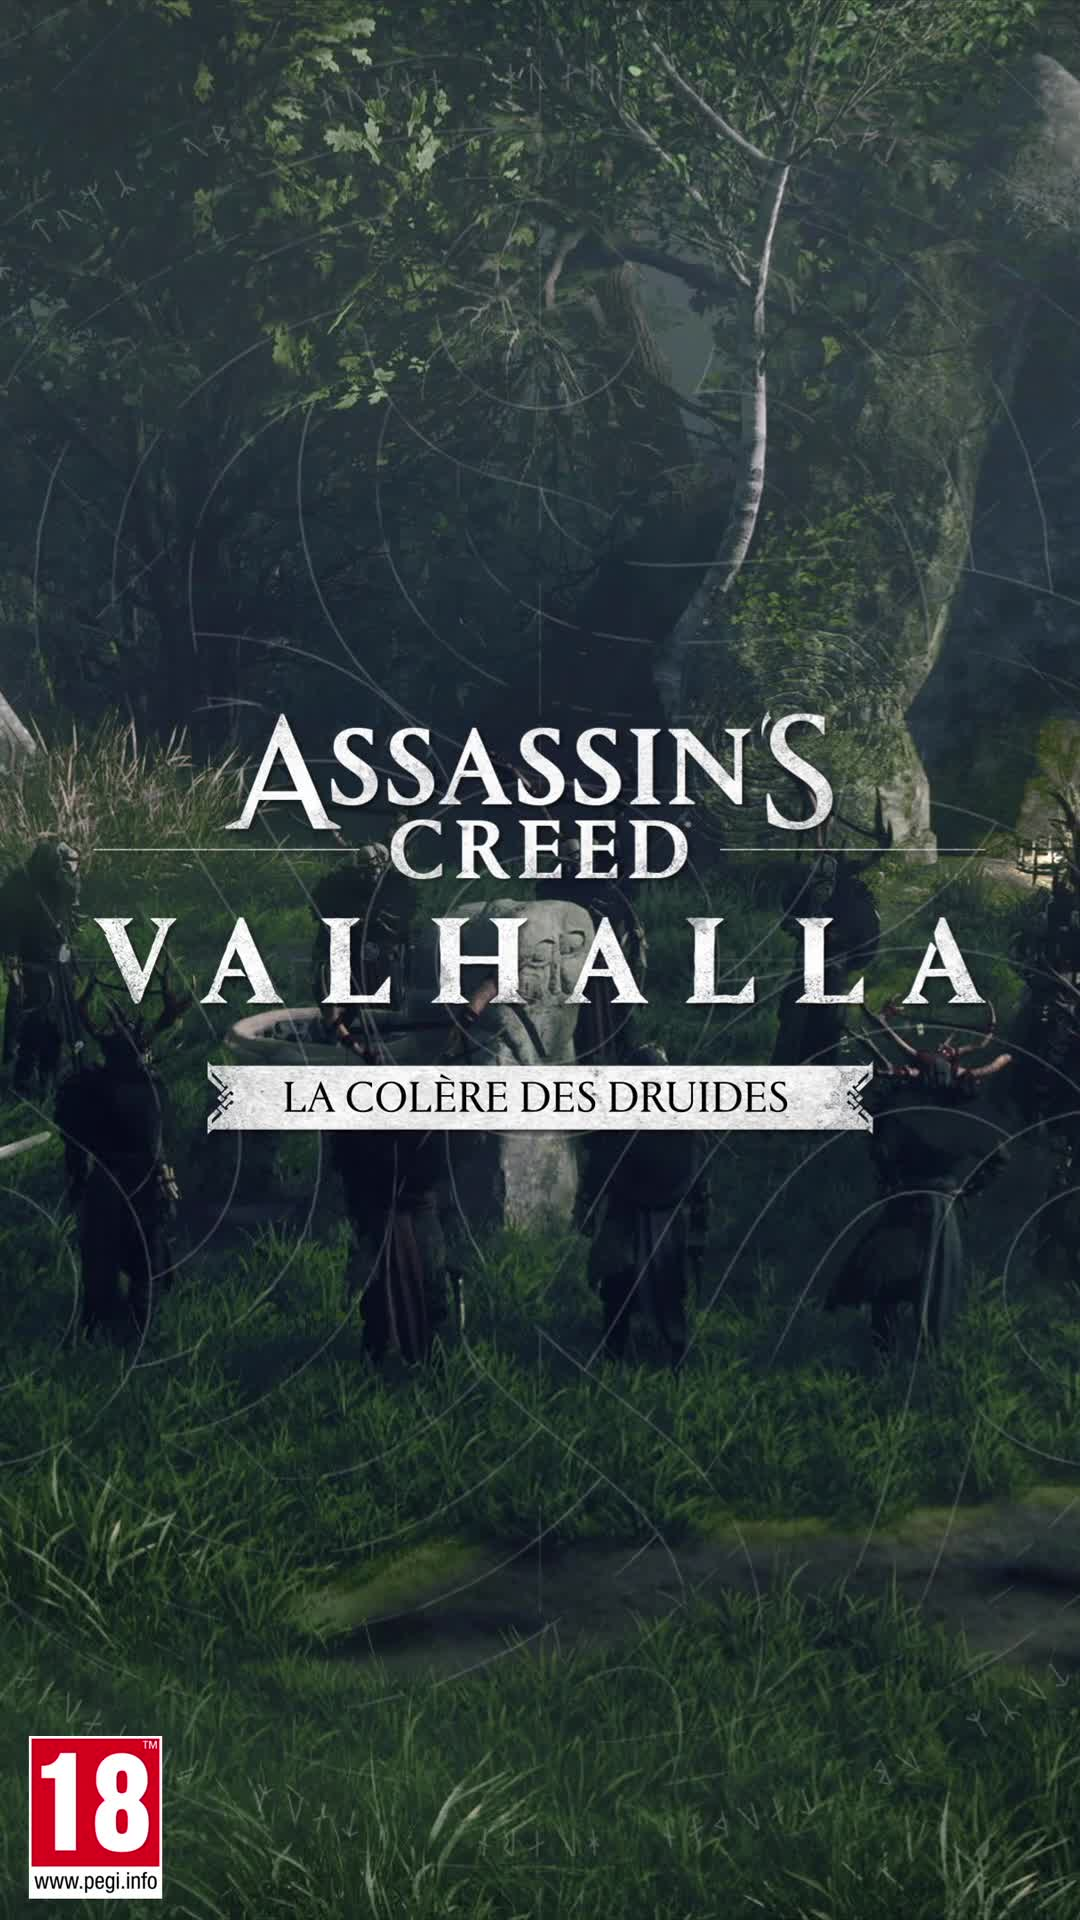 Assassin's Creed Valhalla : Trailer cinmatique en premire mondiale